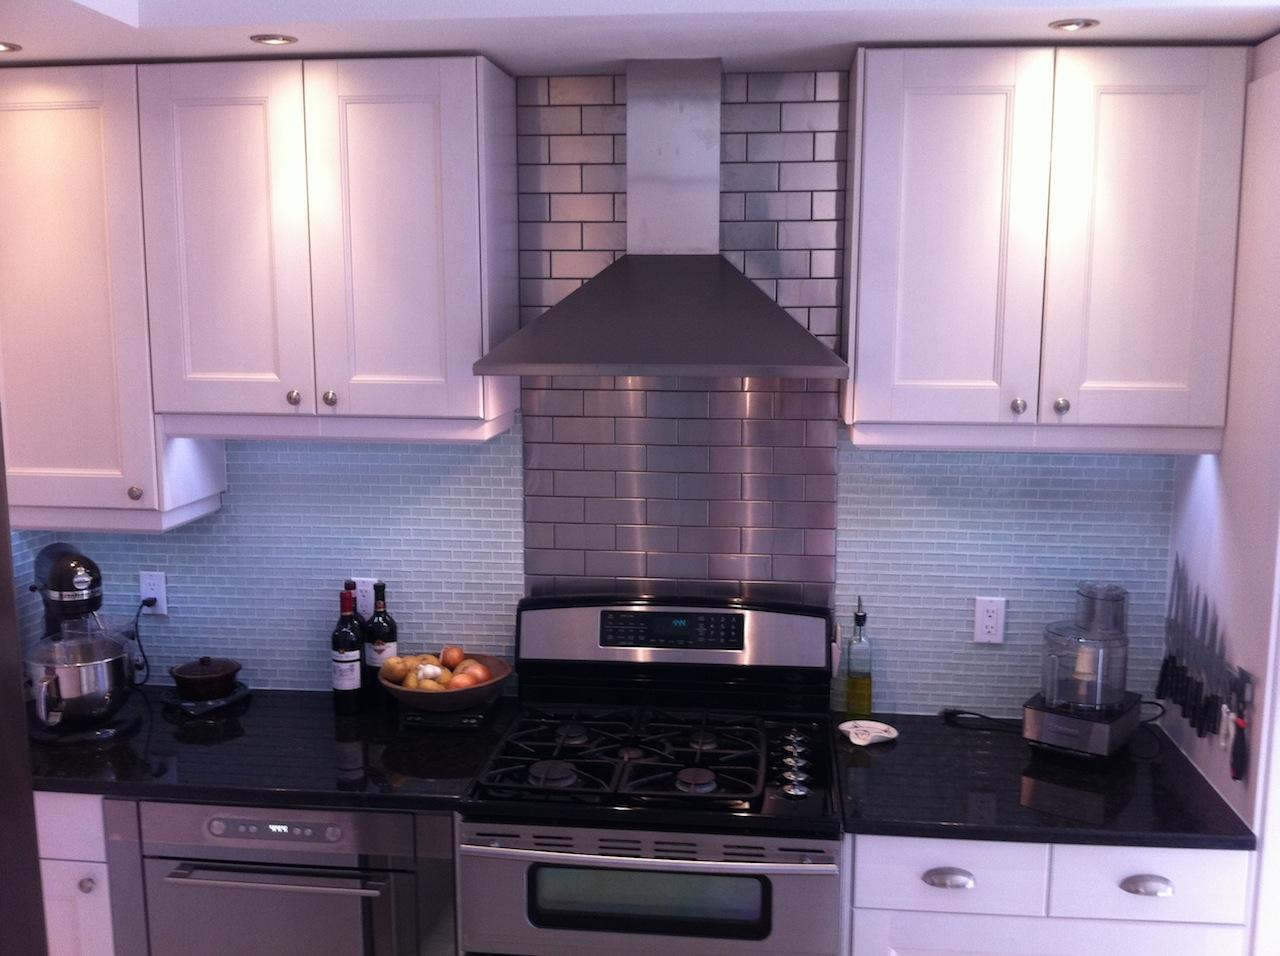 Remodel series kitchen part 5 finale badzoot for Ikea kitchen hood